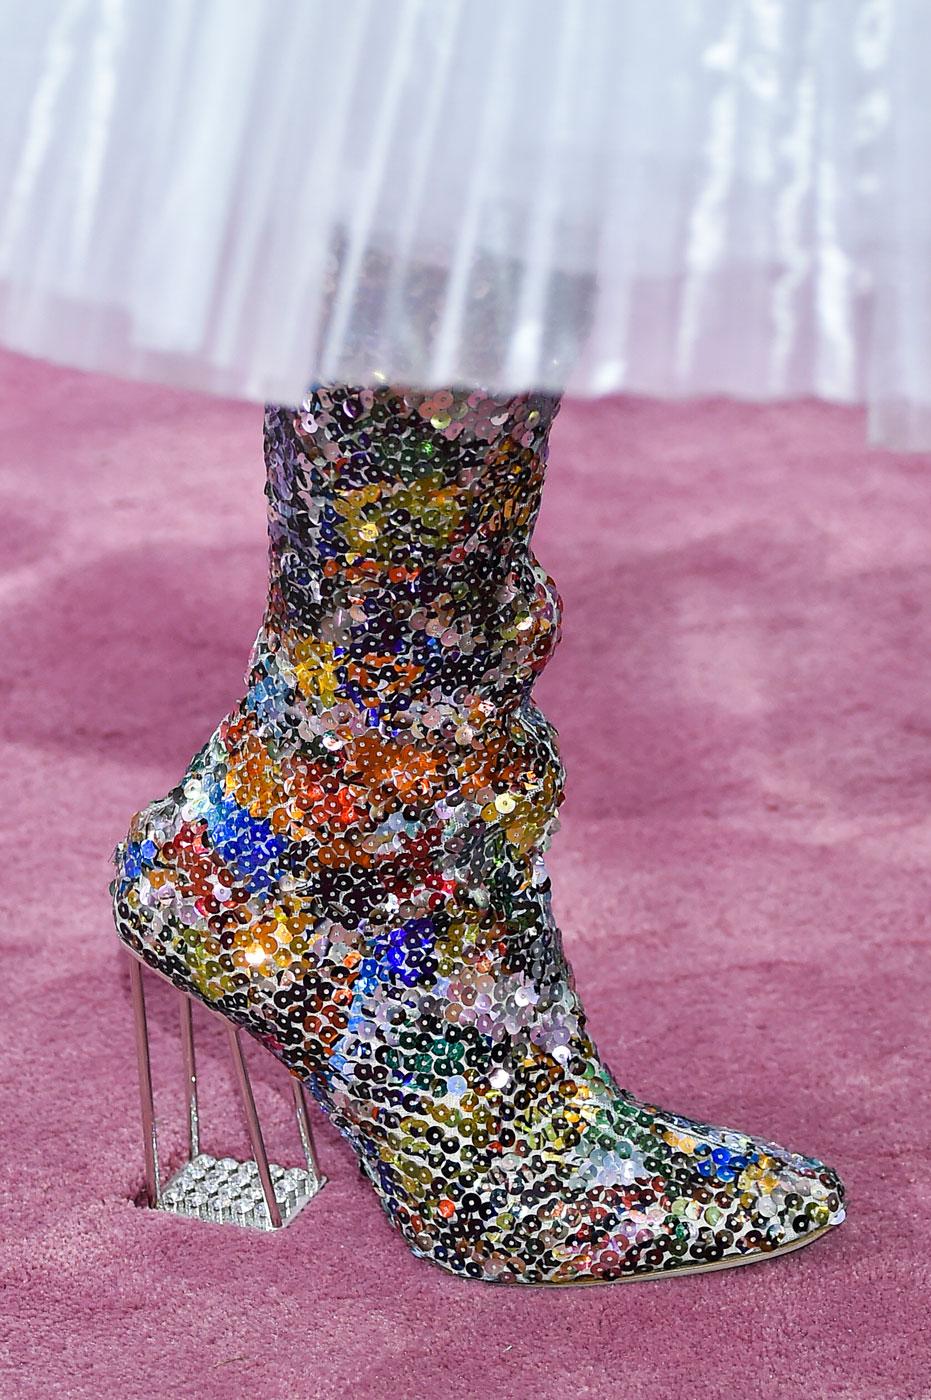 Christian-Dior-fashion-runway-show-close-ups-haute-couture-paris-spring-summer-2015-the-impression-150